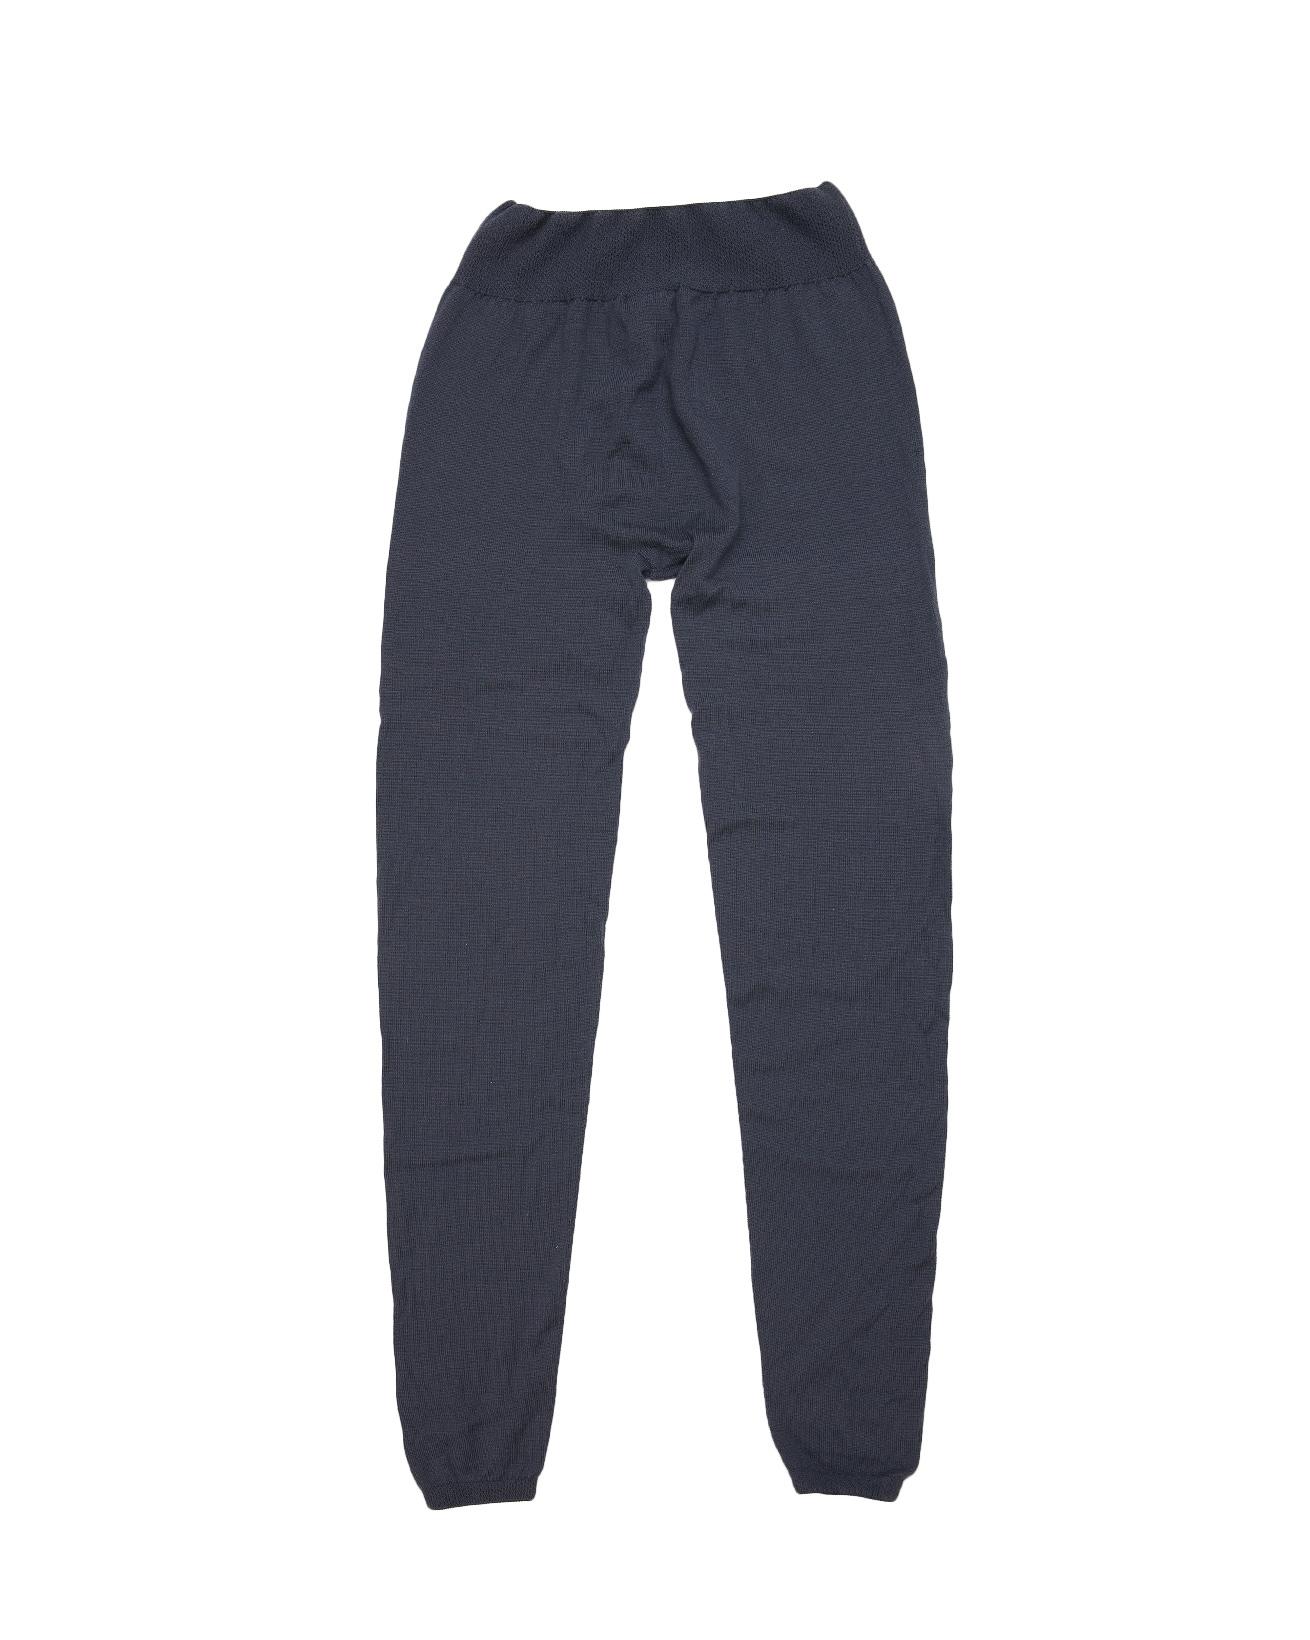 2773-merino lounge pants - slate grey - size small - back.jpg